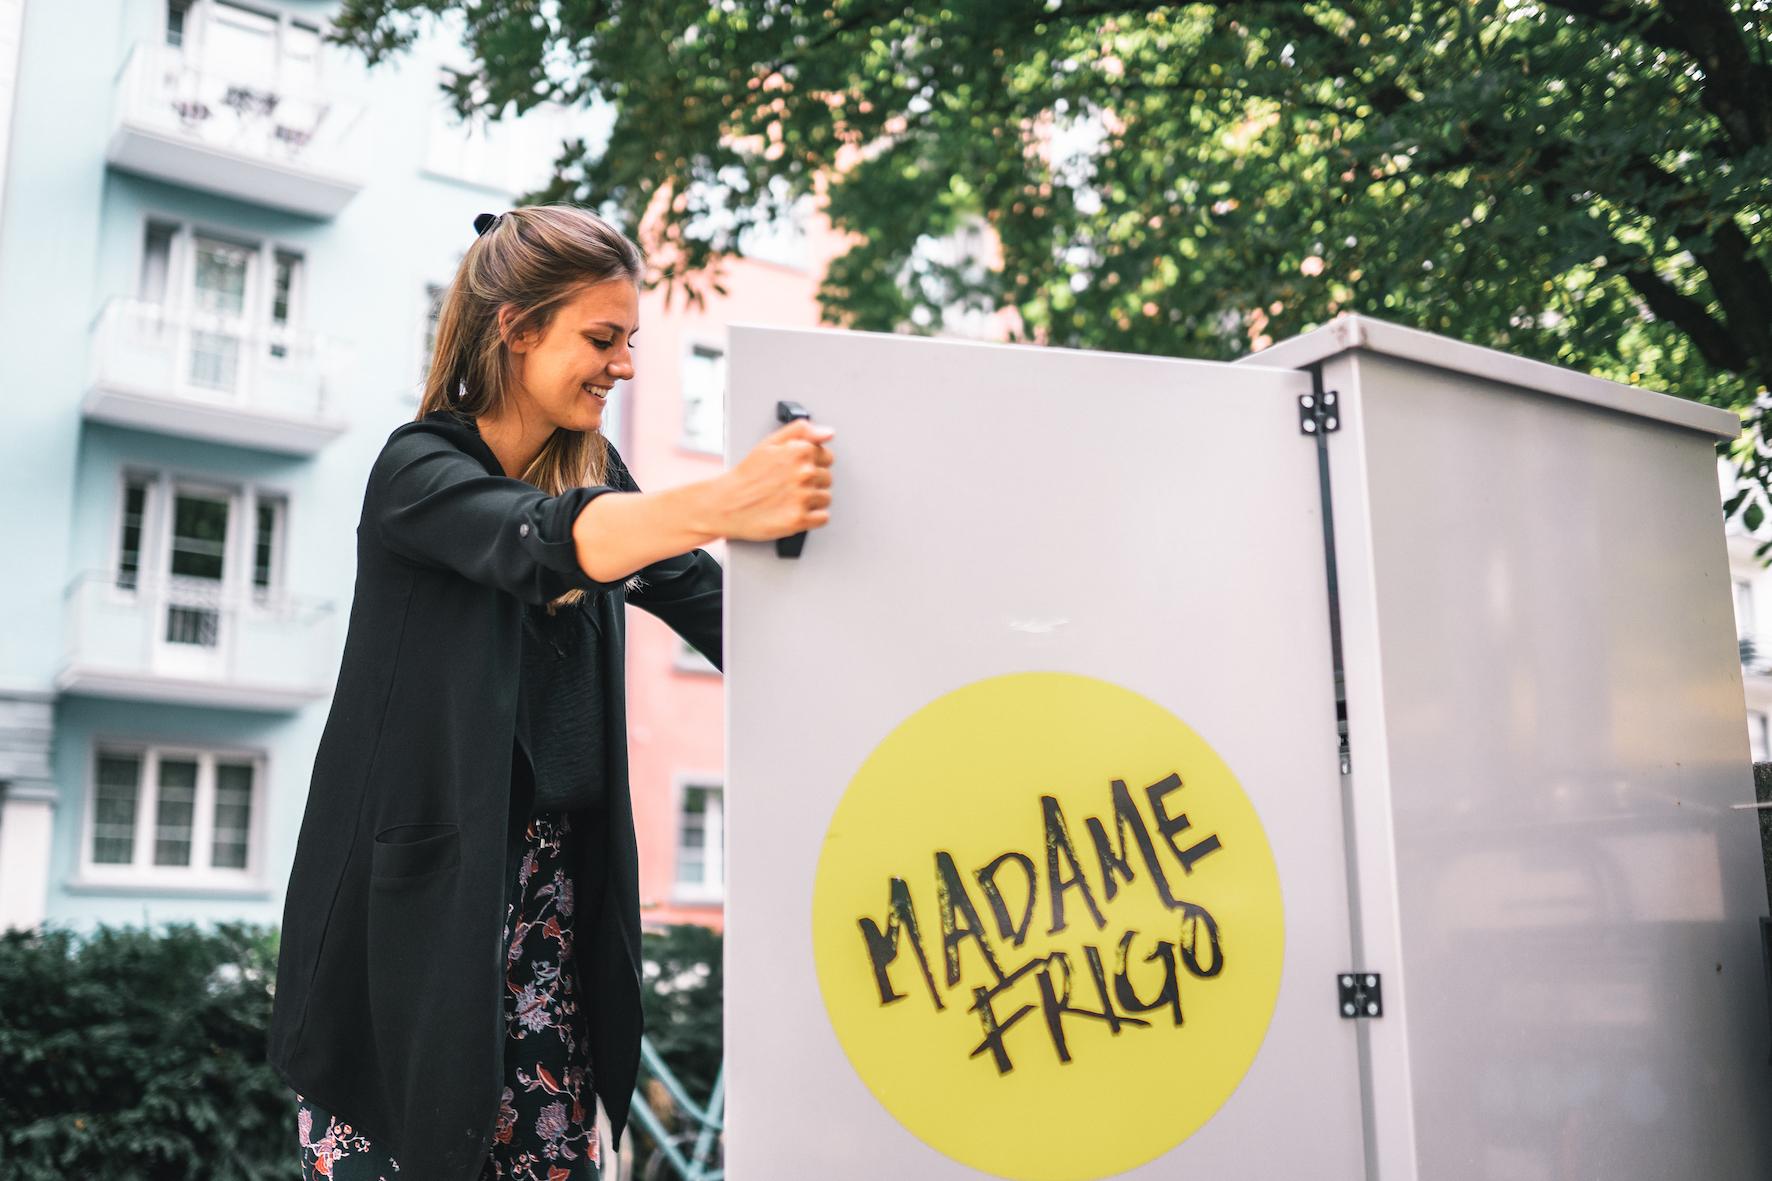 Jana öffnet den Kühlschrank